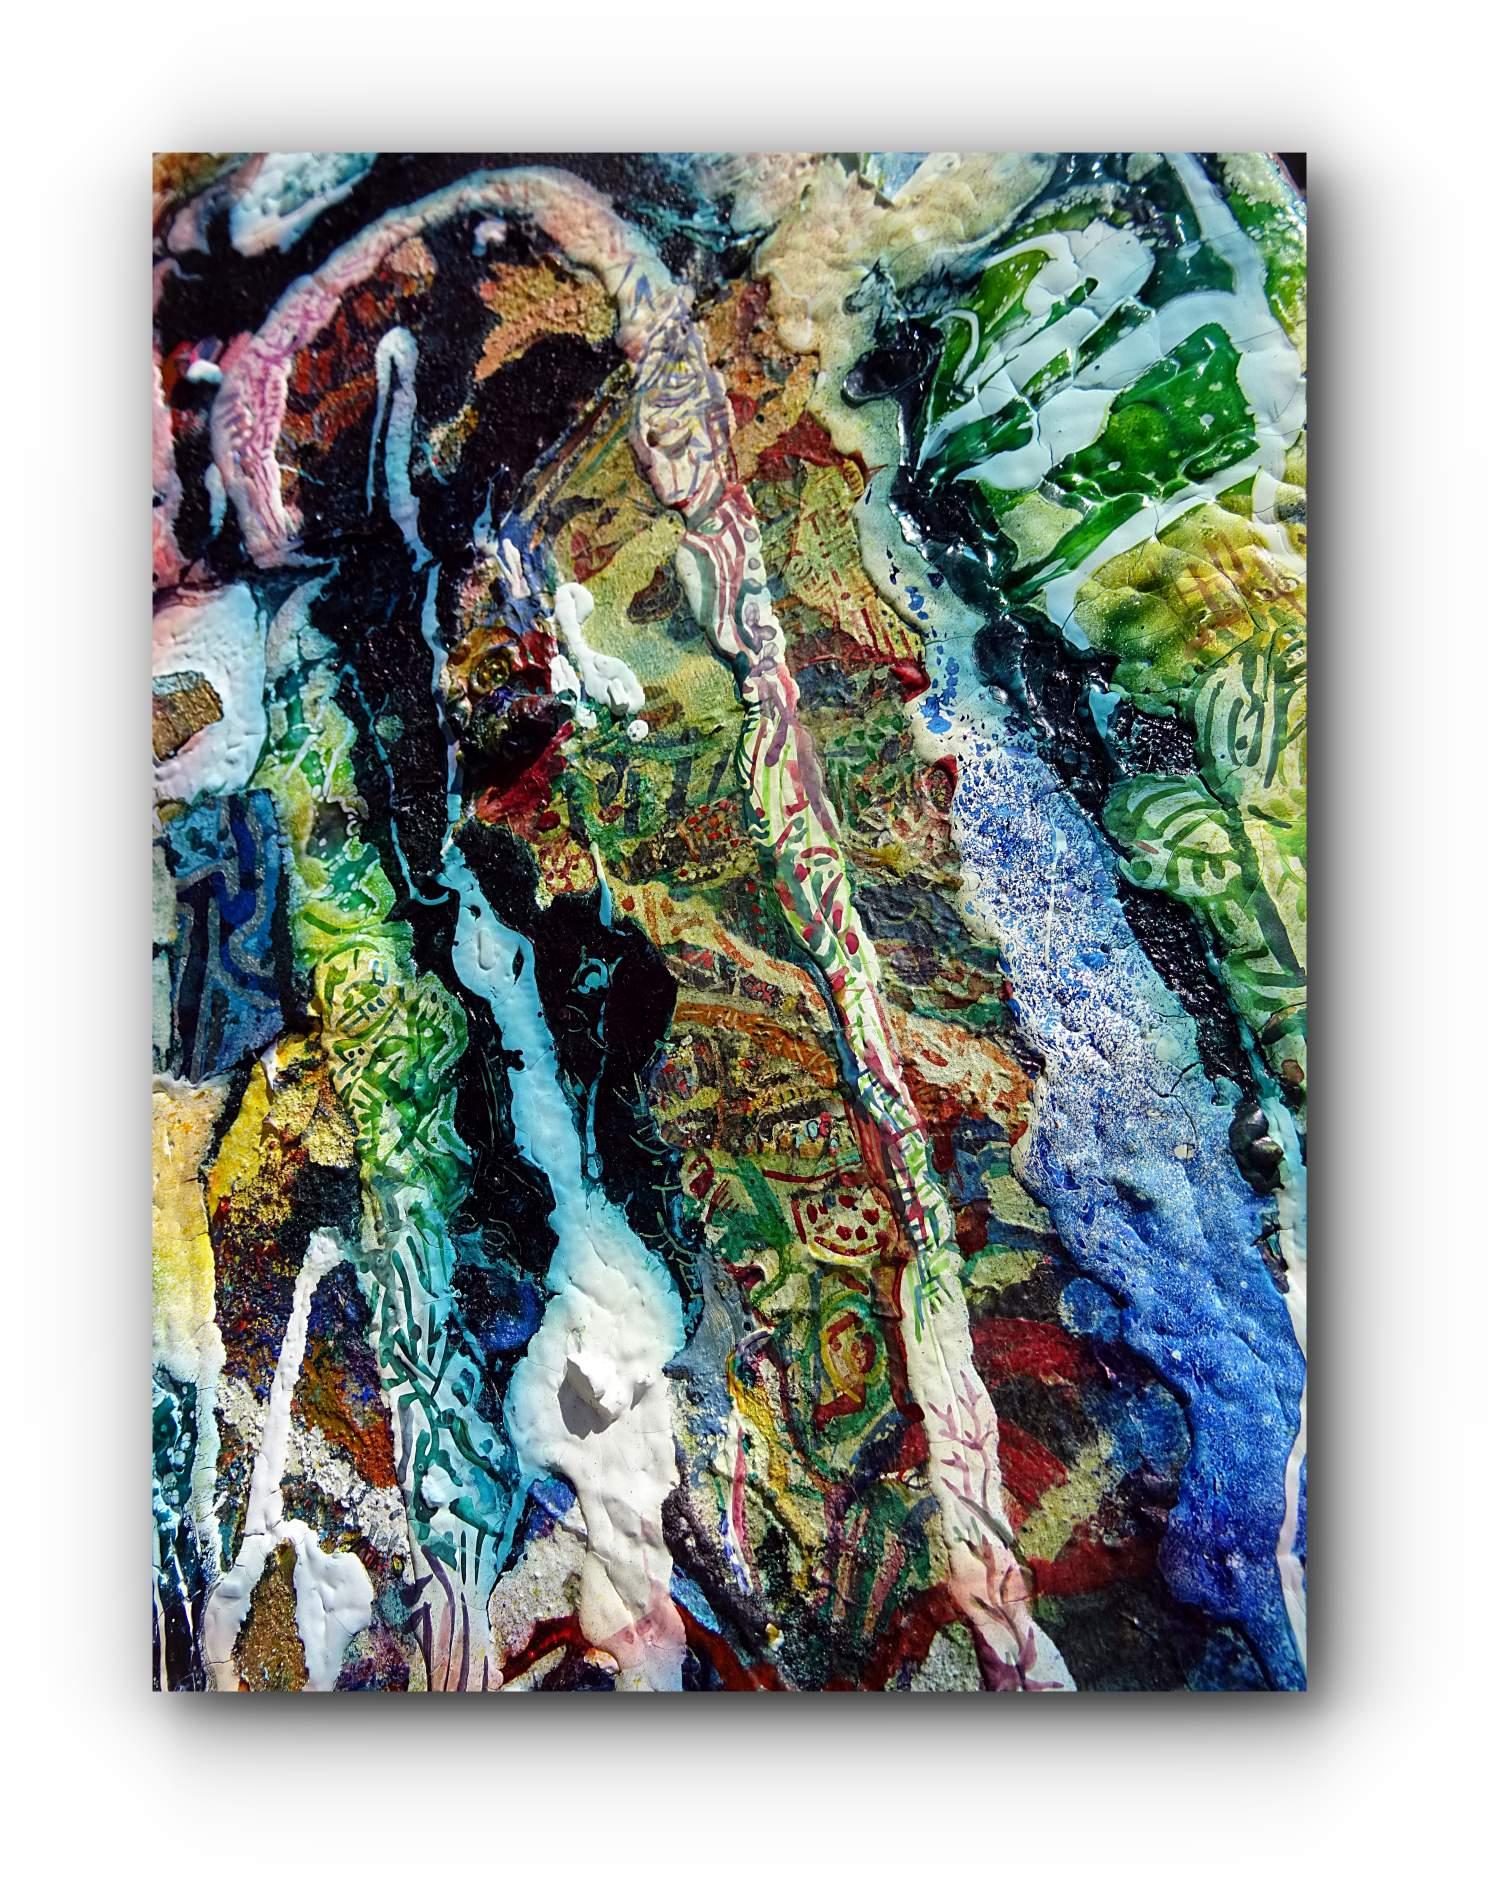 painting-detail-10-kiss-artist-duo-ingress-vortices.jpg